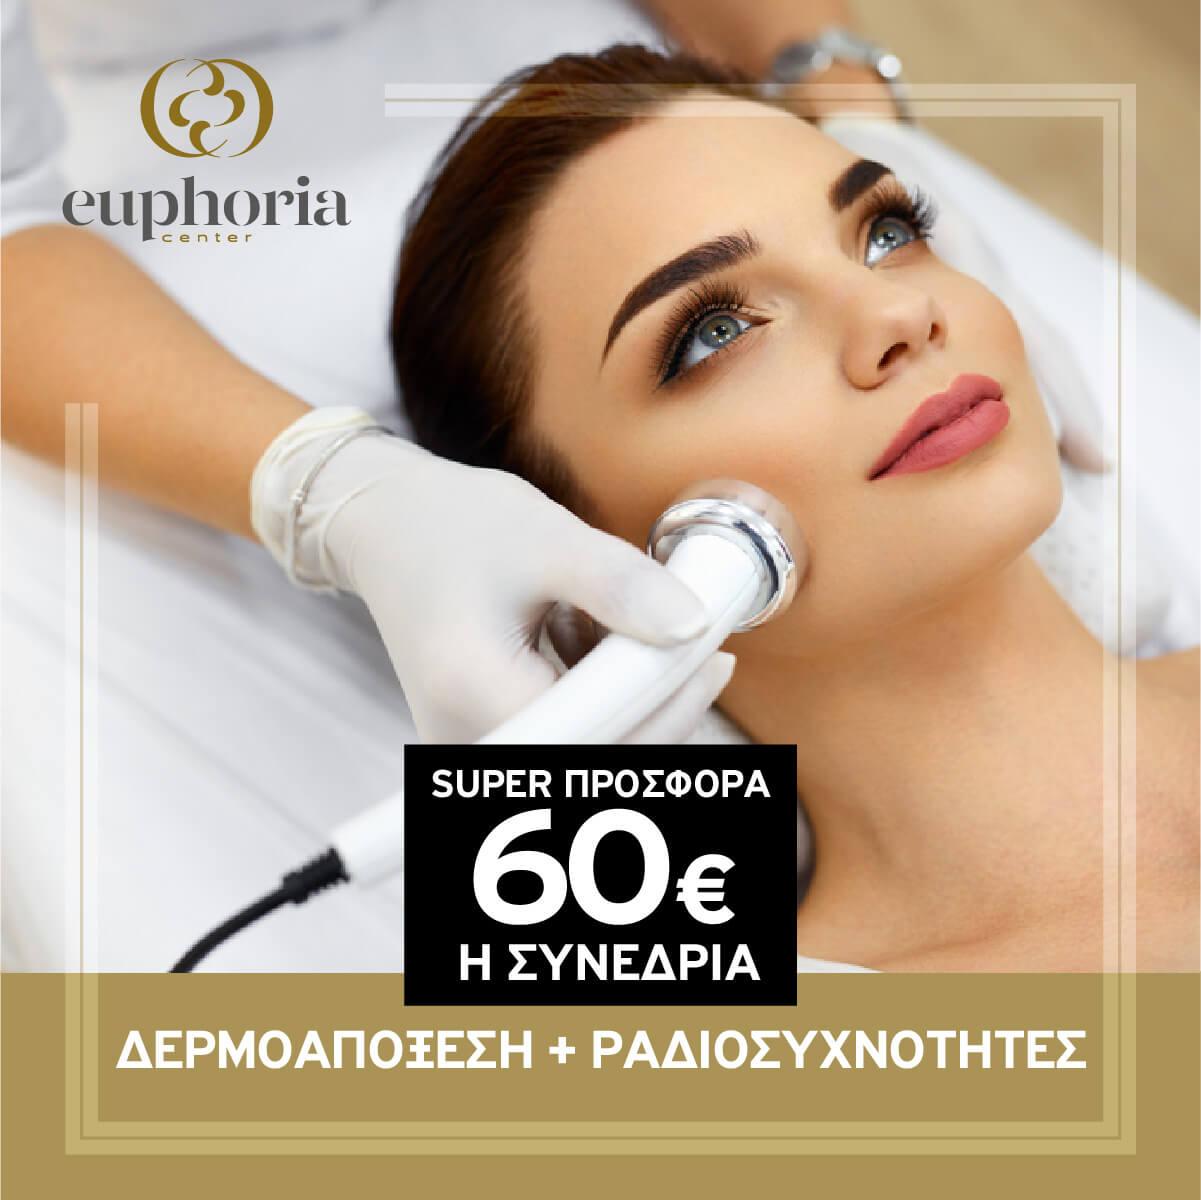 Euphoria Center Ioannina | Θεραπεία δερμοαπόξεσης & Ραδιοσυχνοτήτων | Προσφορά πακέτου στα €60 η συνεδρία